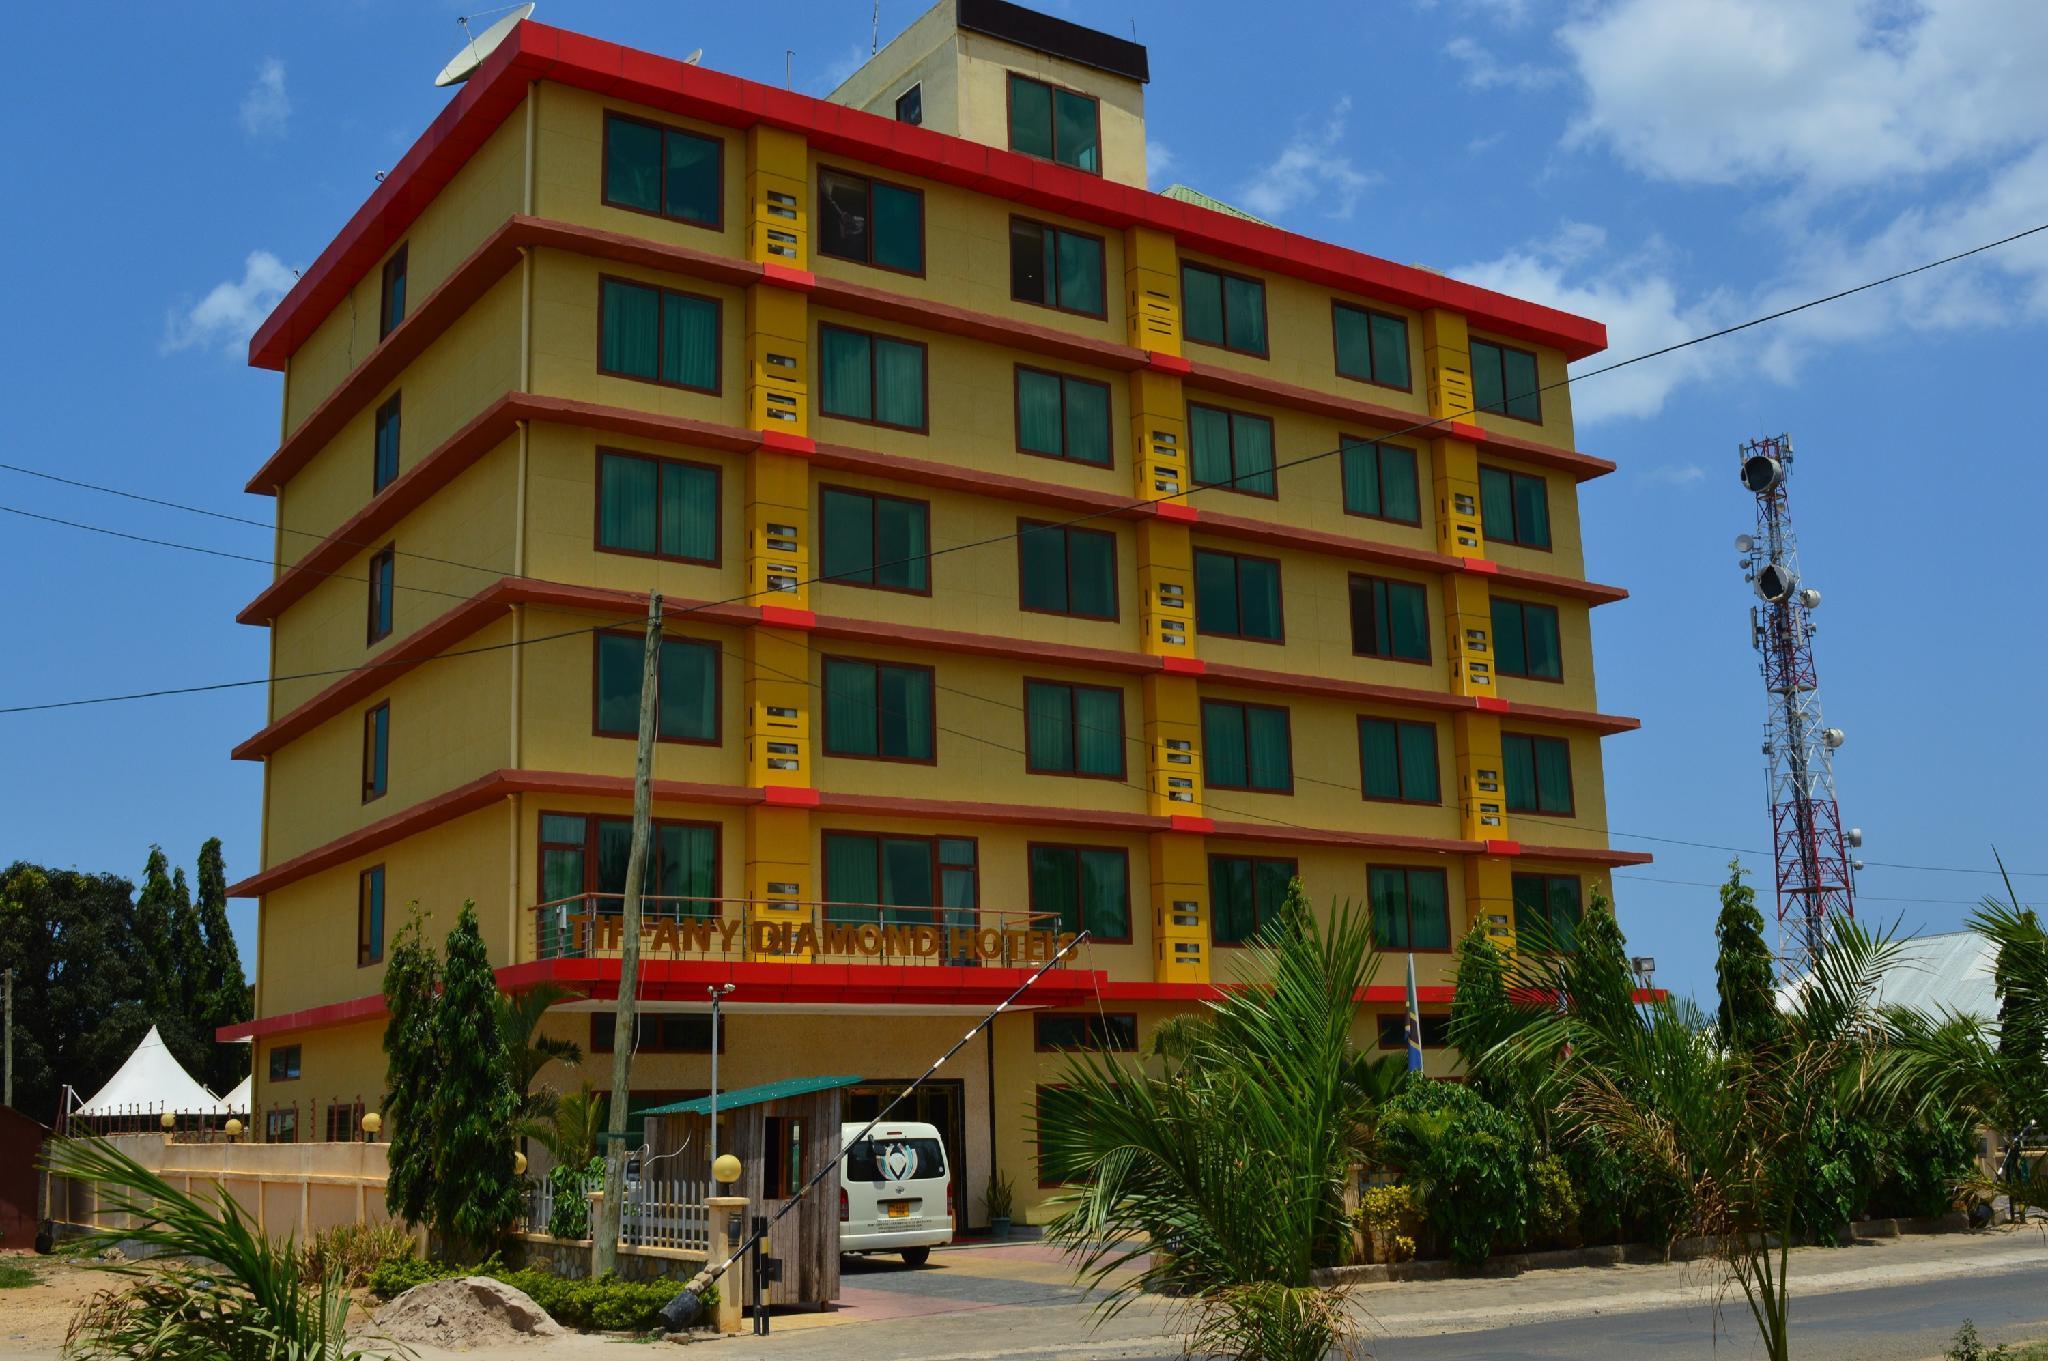 Tiffany Diamond Hotel Mtwara